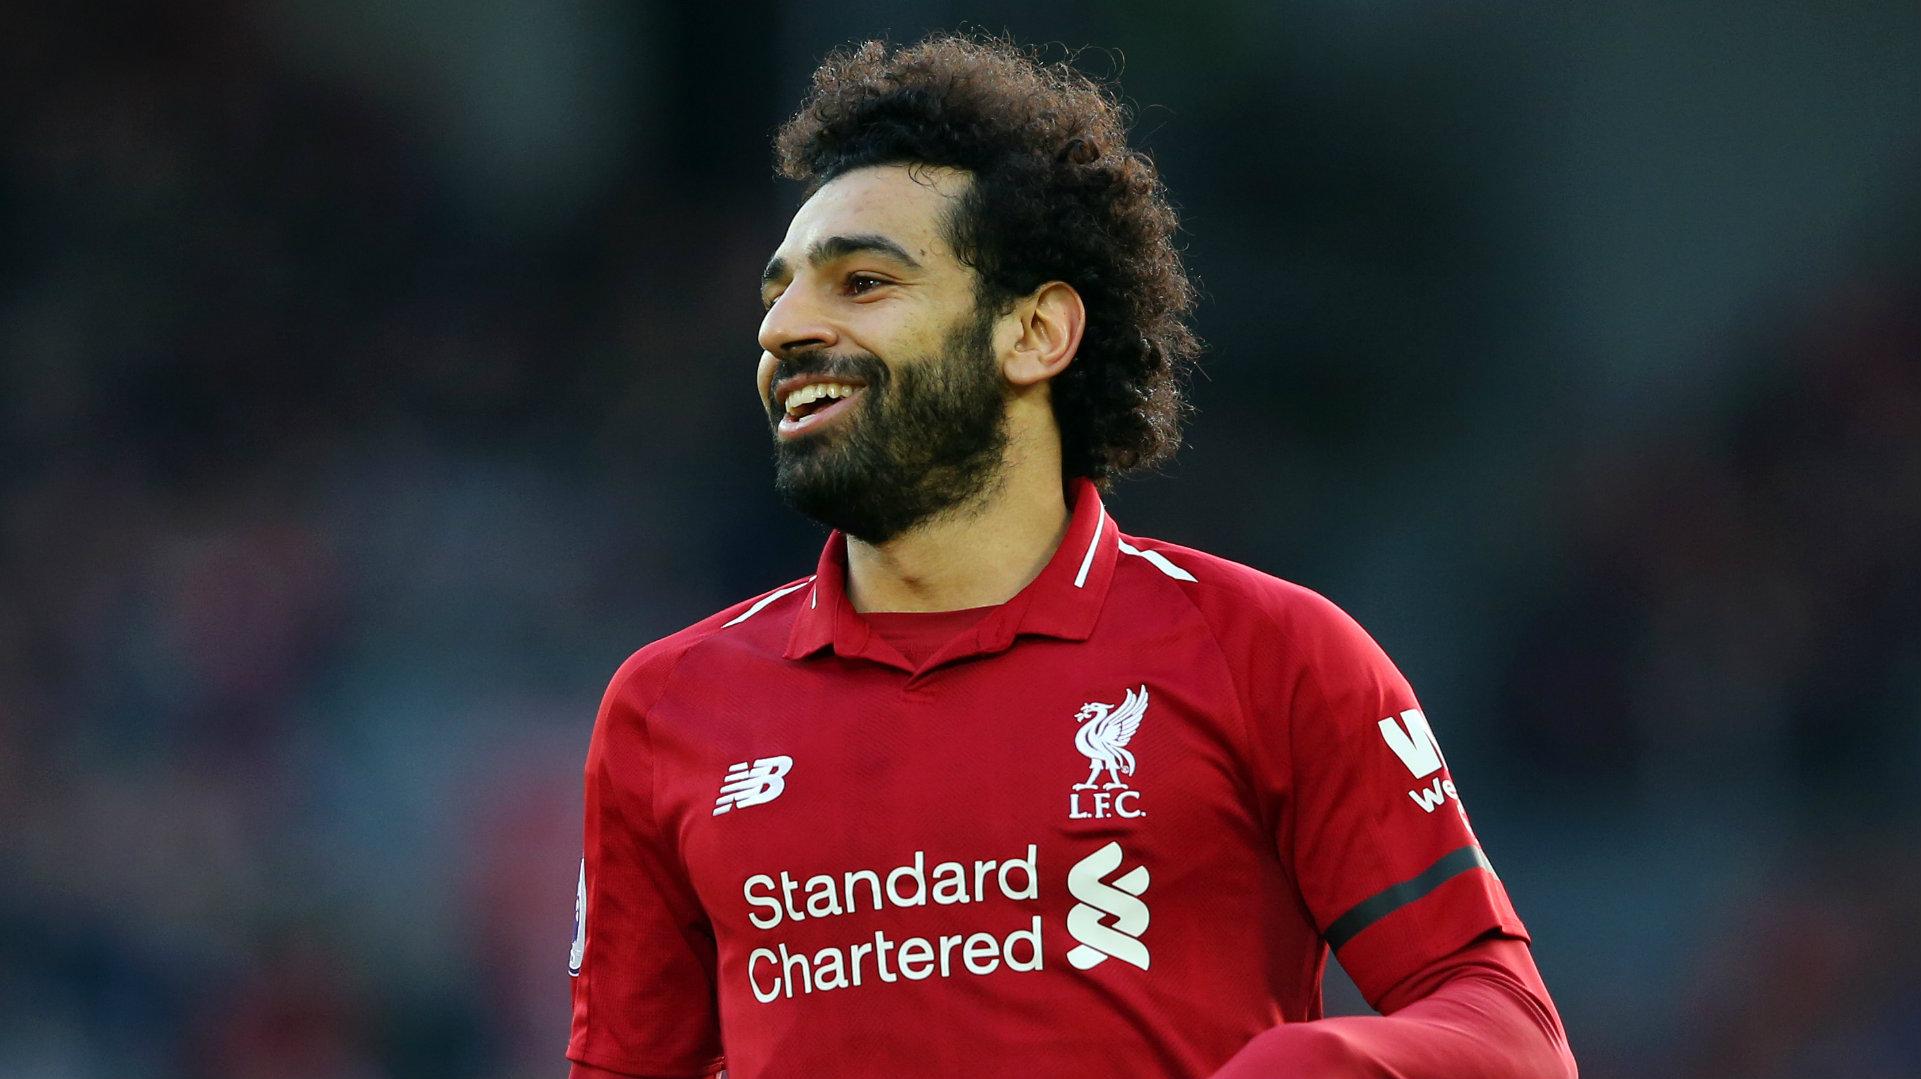 Mohamed Salah: EXTRA TIME: Liverpool's Mohamed Salah Shaves Off Trademark